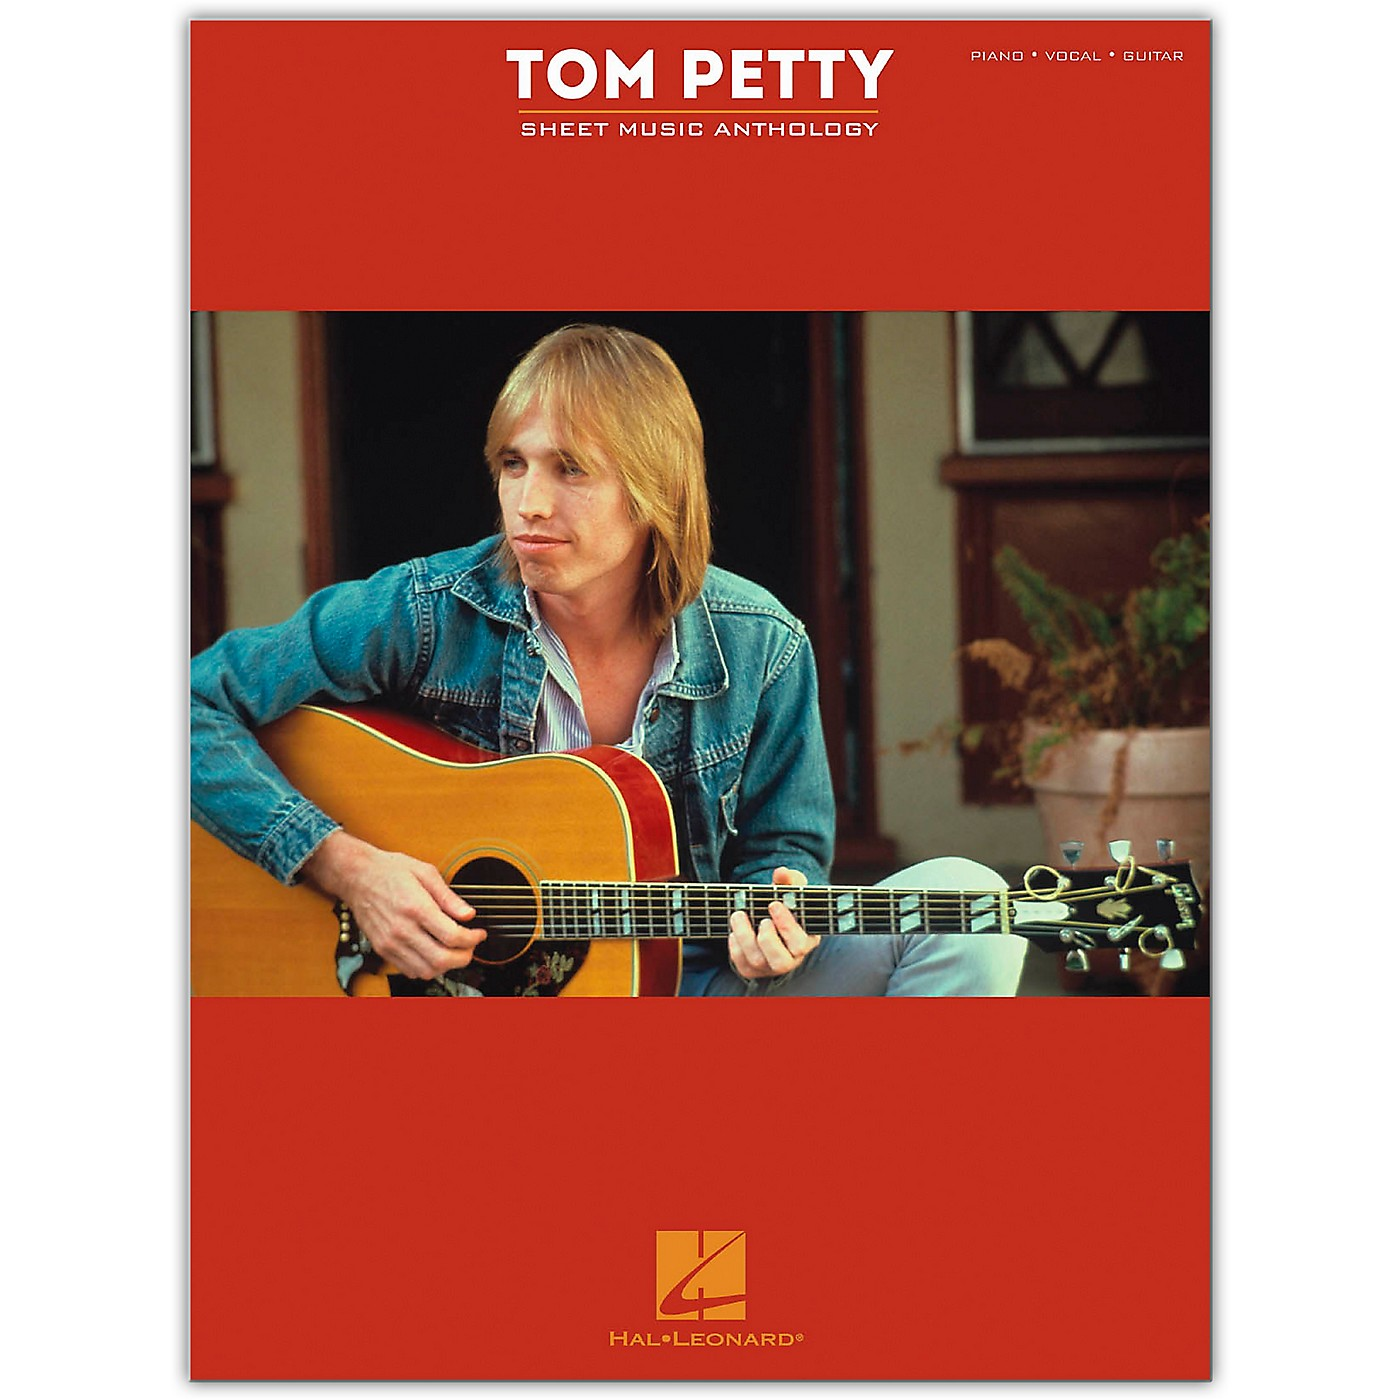 Hal Leonard Tom Petty Sheet Music Anthology - Piano/Vocal/Guitar Artist Songbook thumbnail